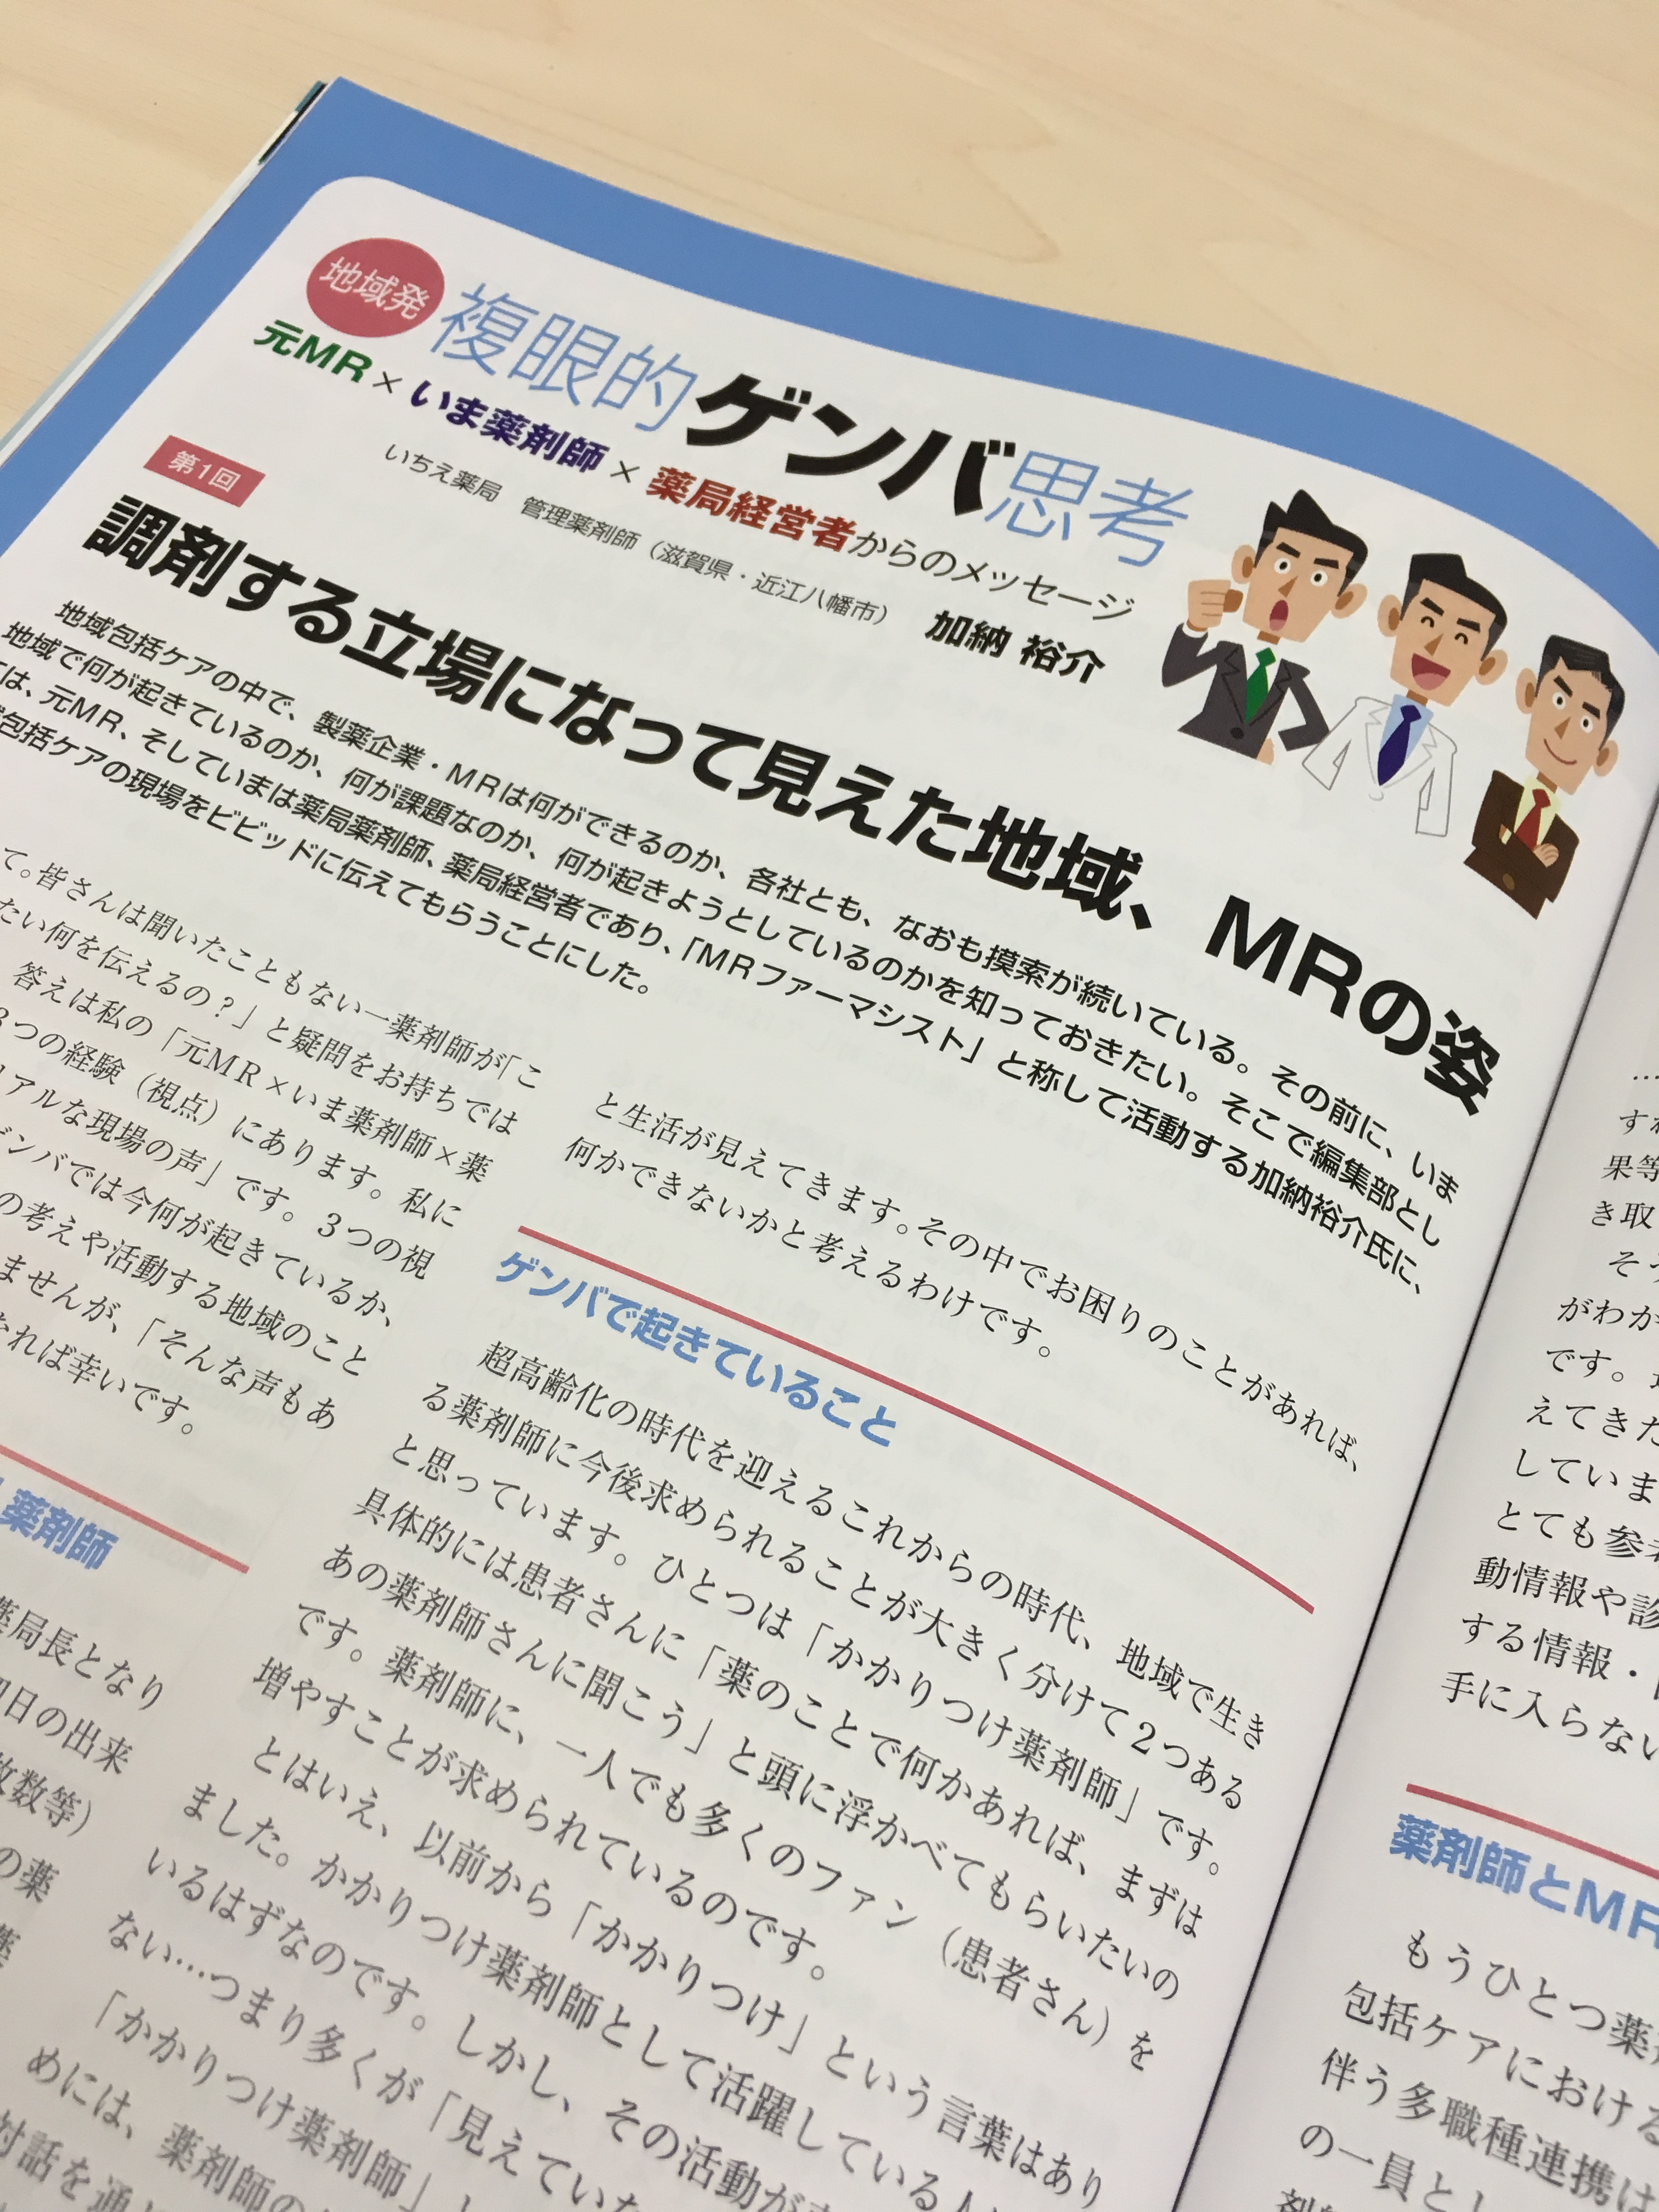 Monthly ミクス2月号に記事が掲載されました